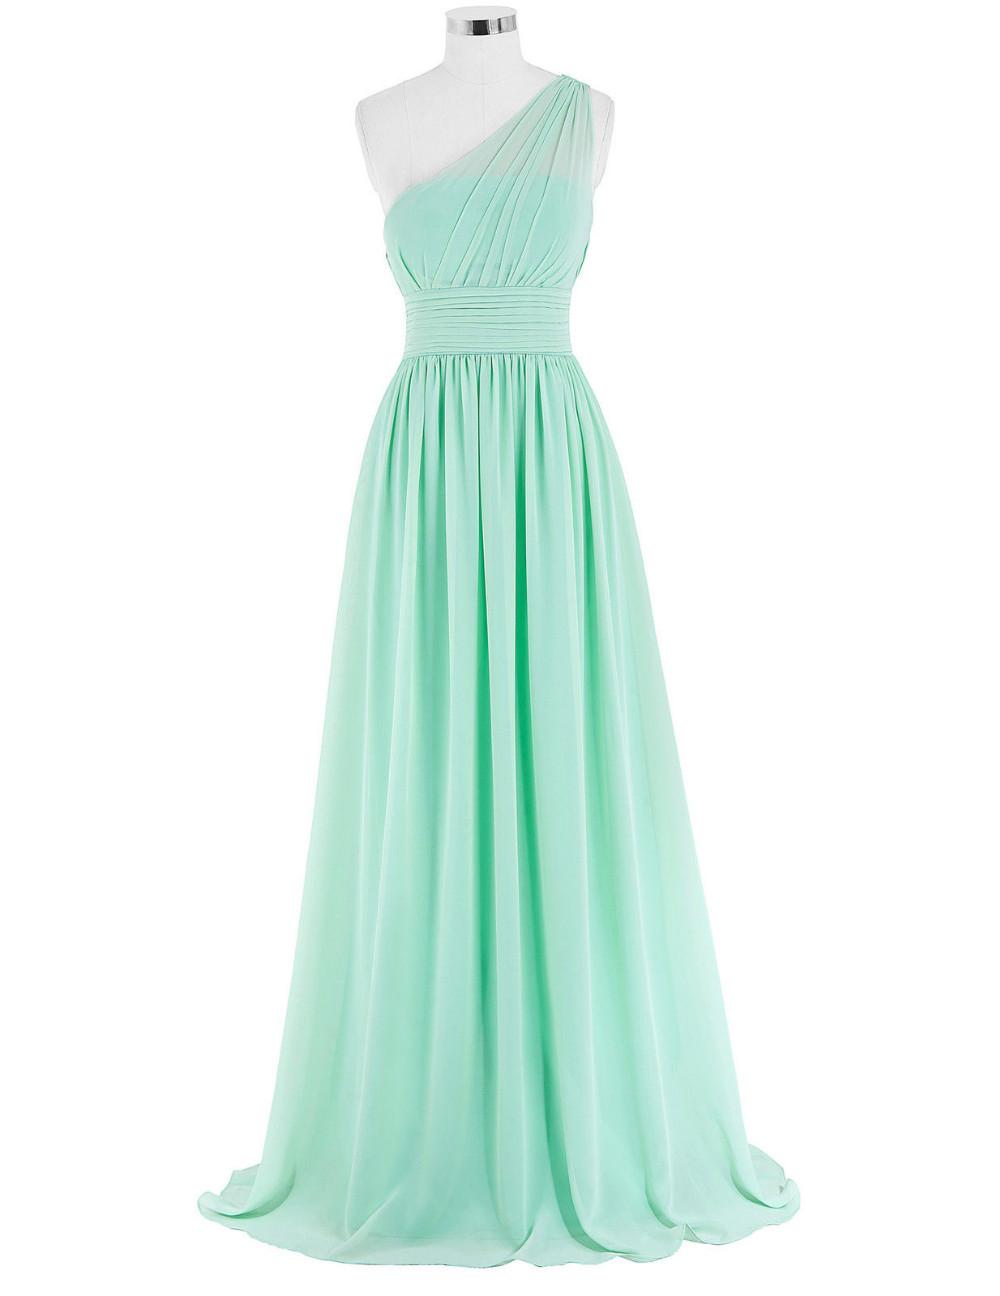 Kate Kasin Mint Green Bridesmaid Dresses Long Wedding Party Dresses One Shouler Bruidsmeisjes Jurk Pink Bridemaid Dress 0200 7